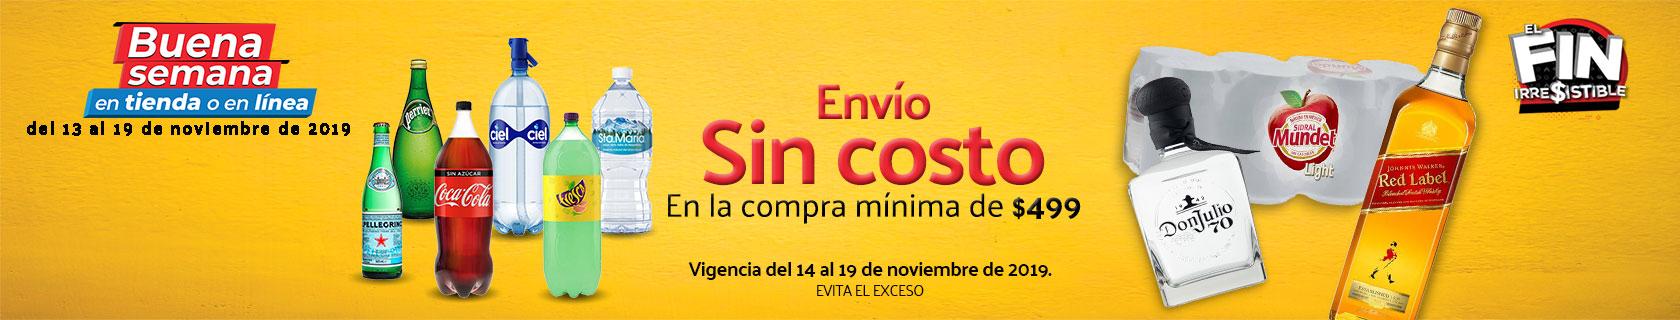 BPD-Buena-Semana-Envio-sin-costo_191114